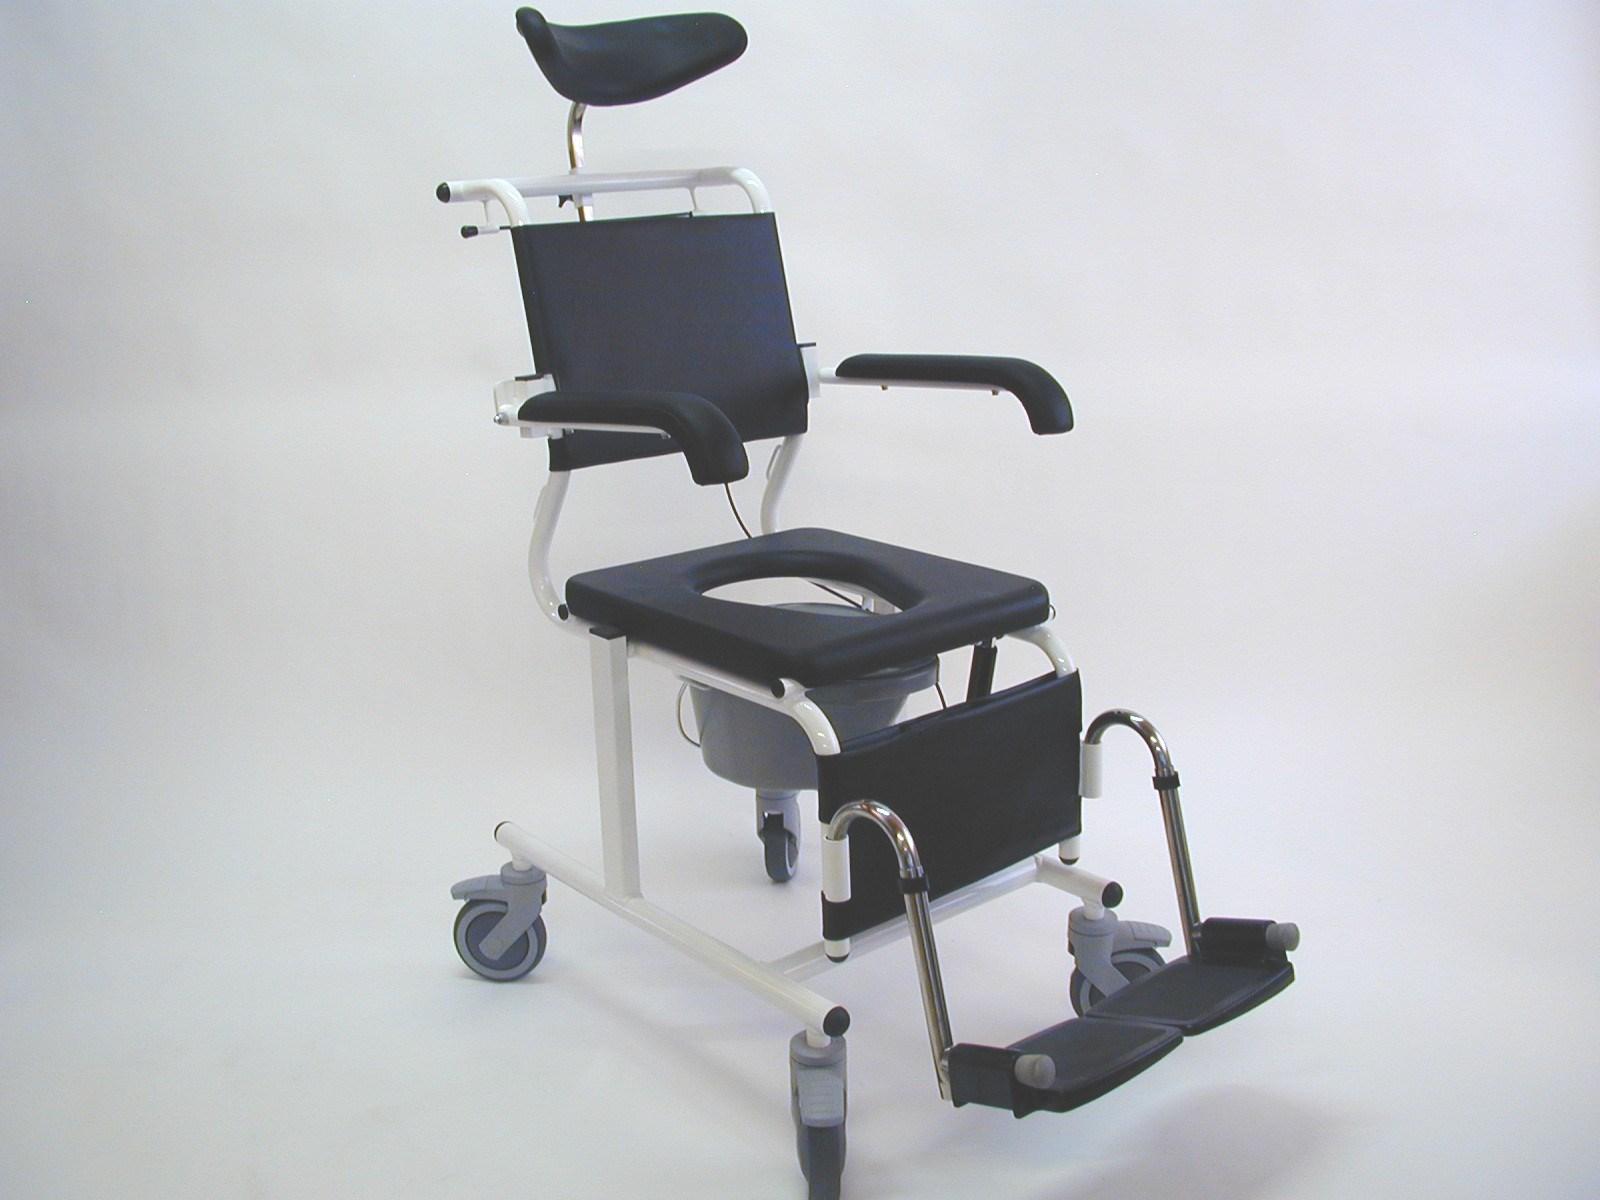 ... ERGOtip 3 Reclining Commode u0026 Shower Chair ... & AssistData - ERGOtip 3 Reclining Commode u0026 Shower Chair from dan ... islam-shia.org